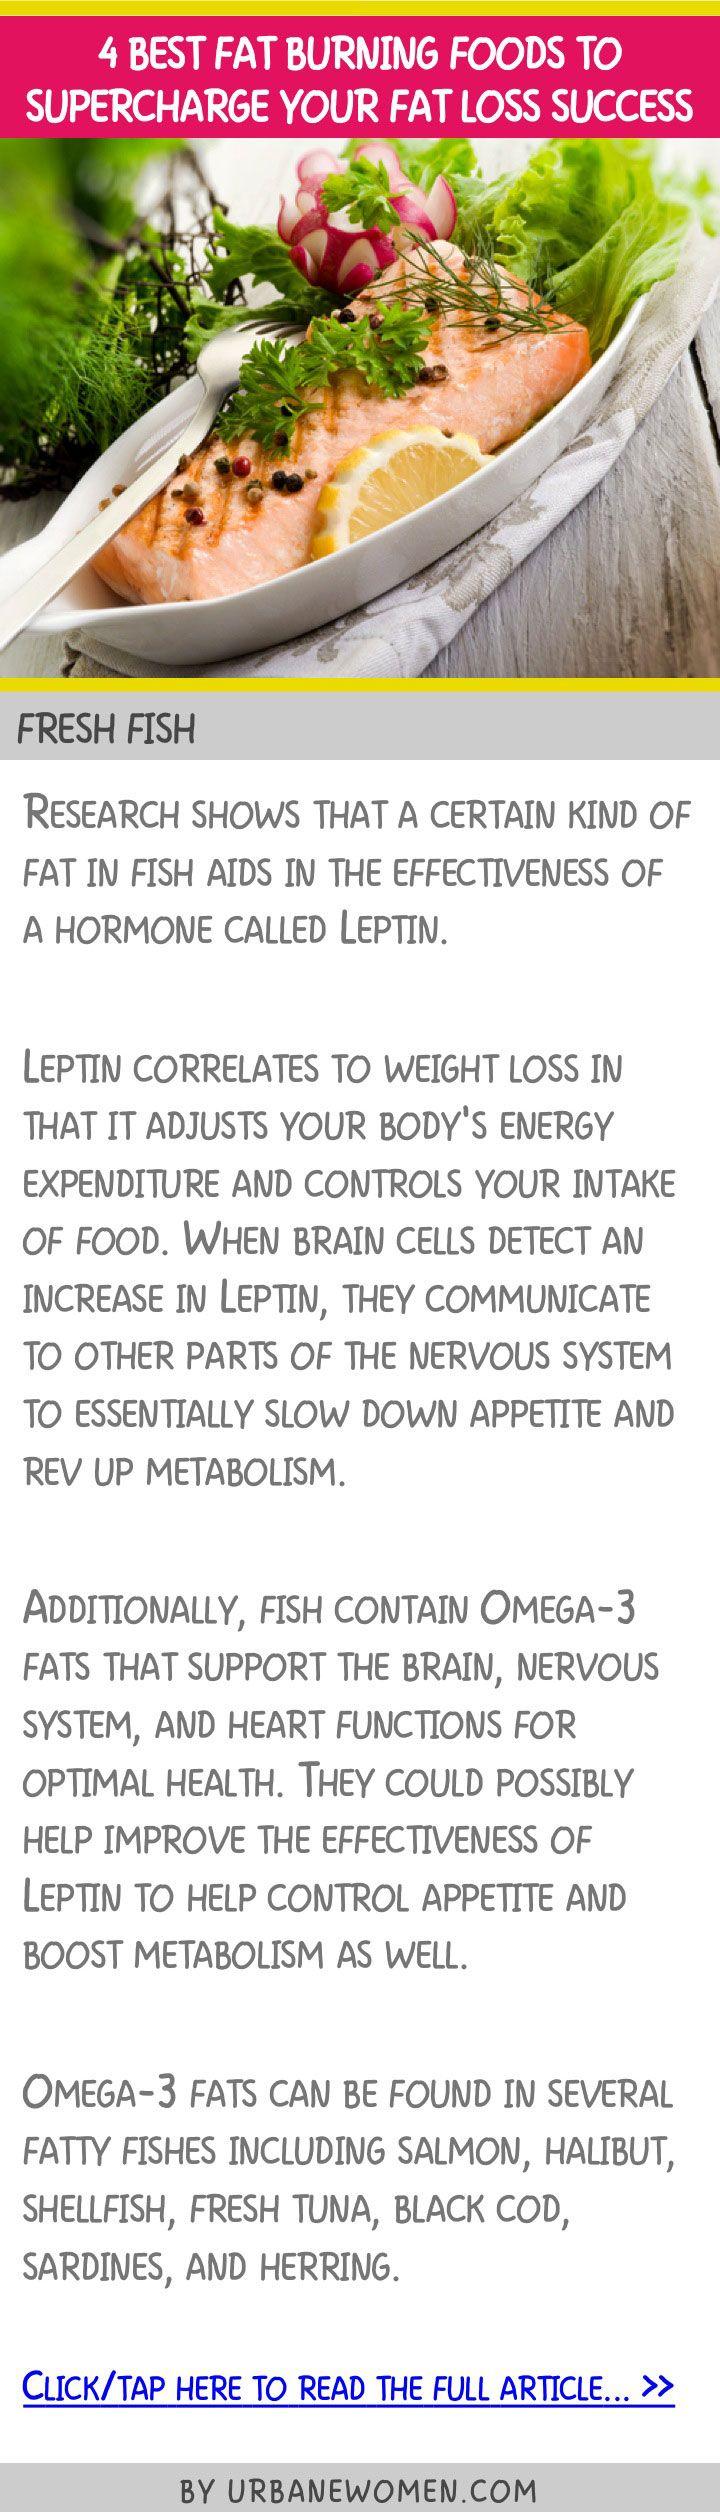 Best weight loss pills vitamin shoppe image 2